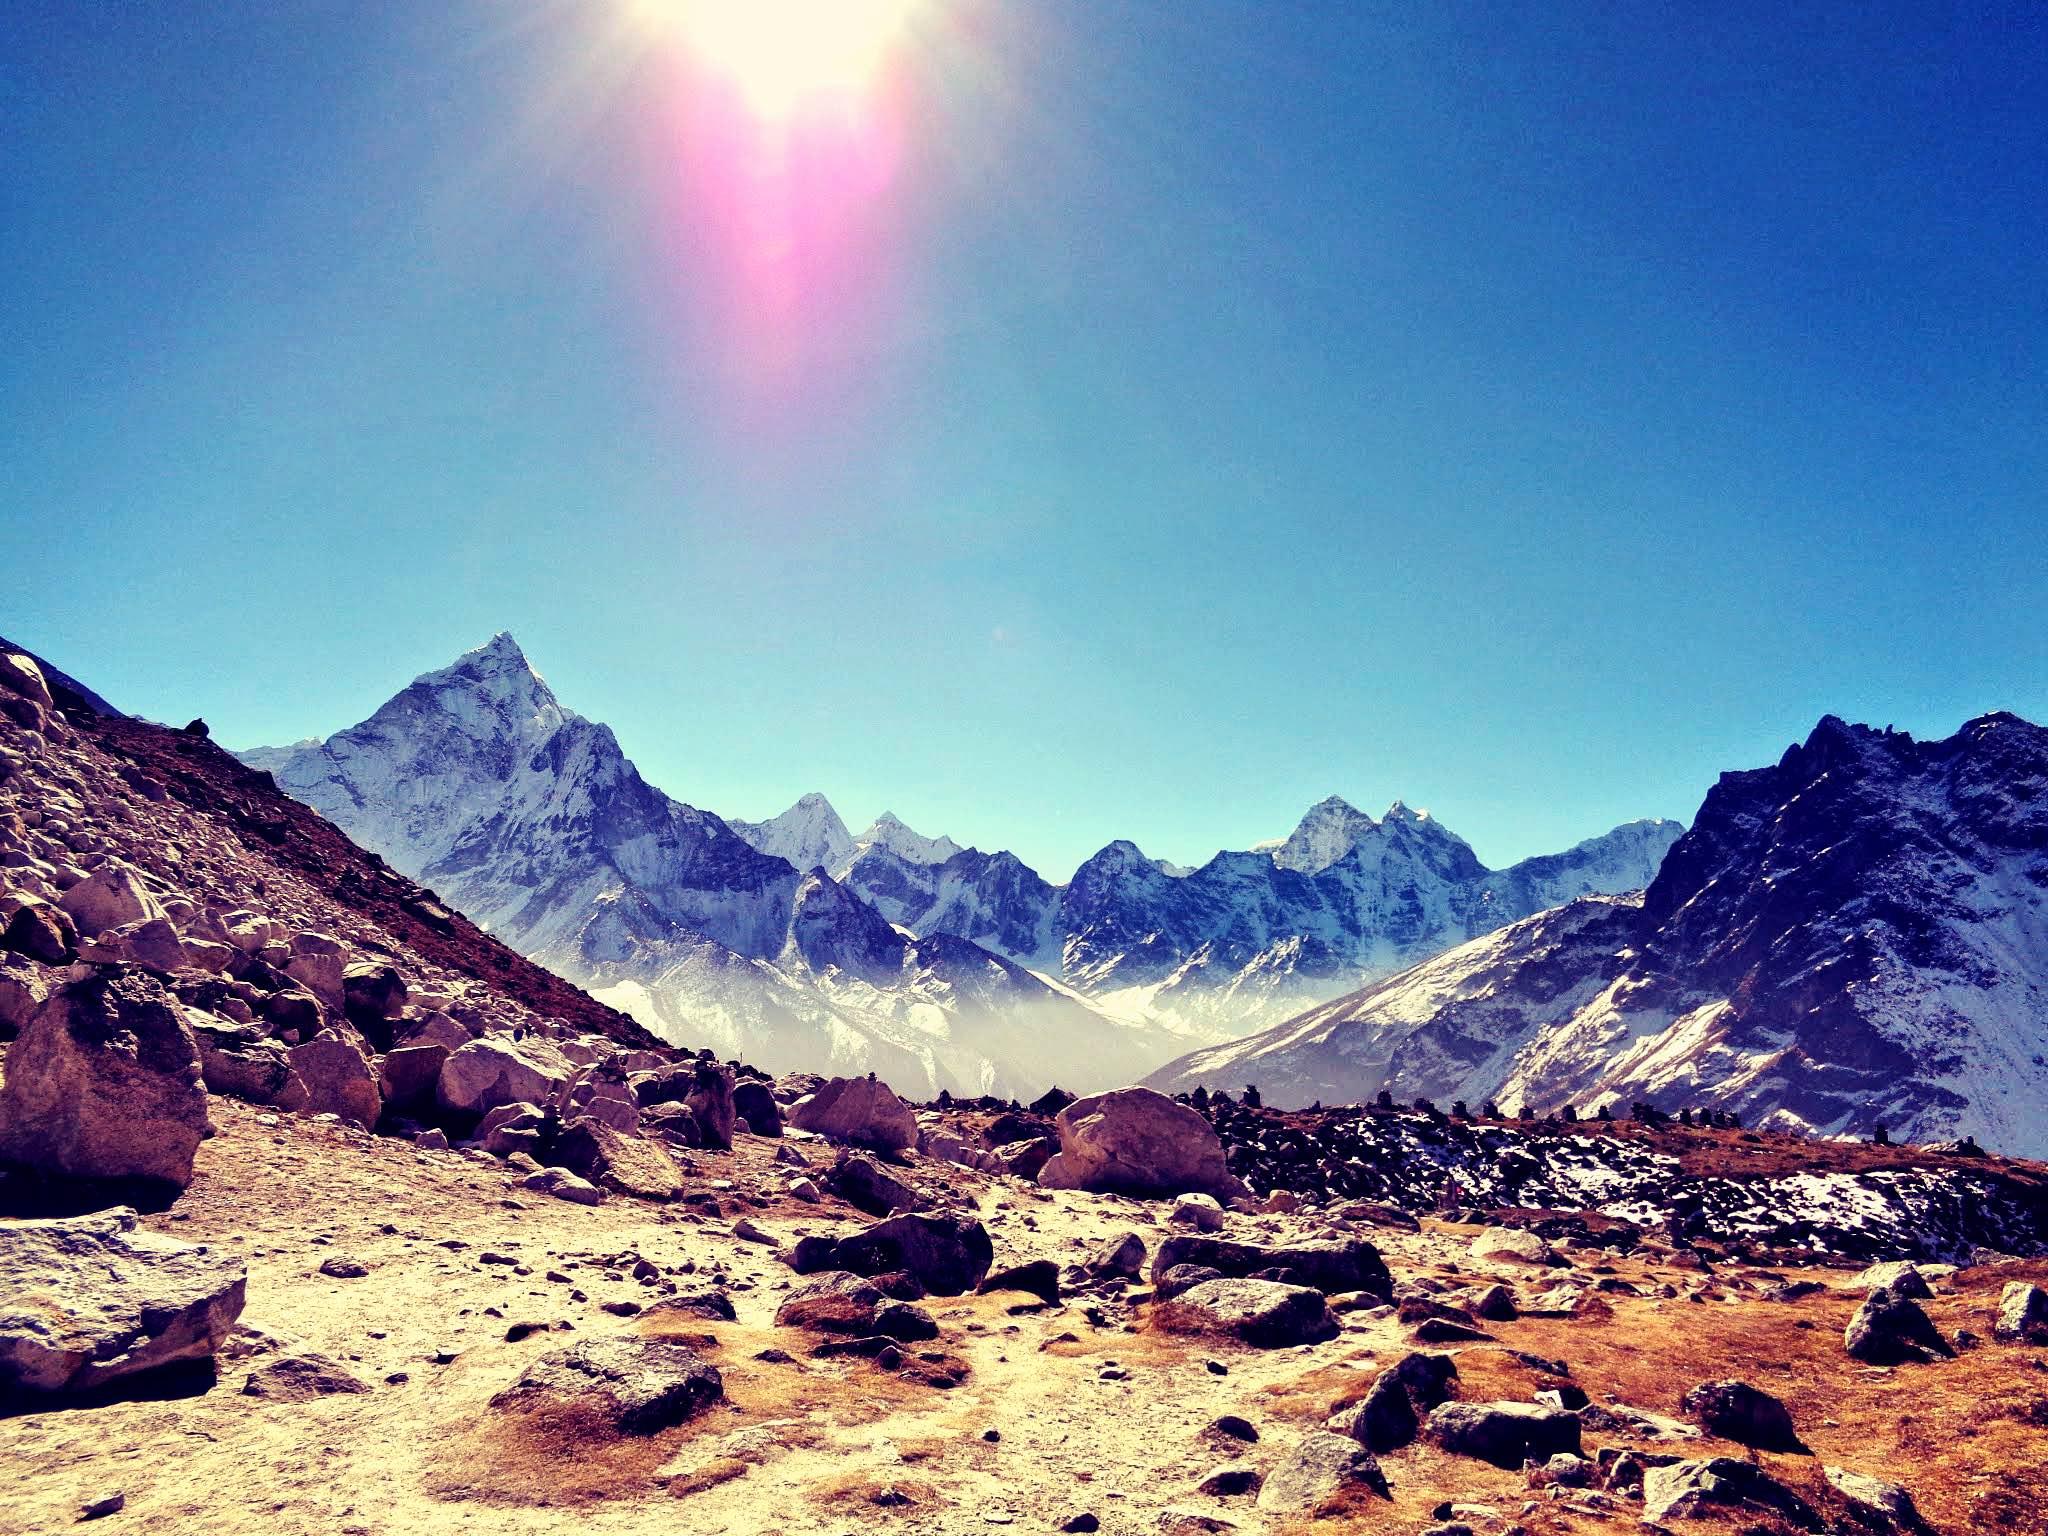 Solig förmiddag i Everestmassivet, Khumbu, Nepal. Foto: Clarence Frenker